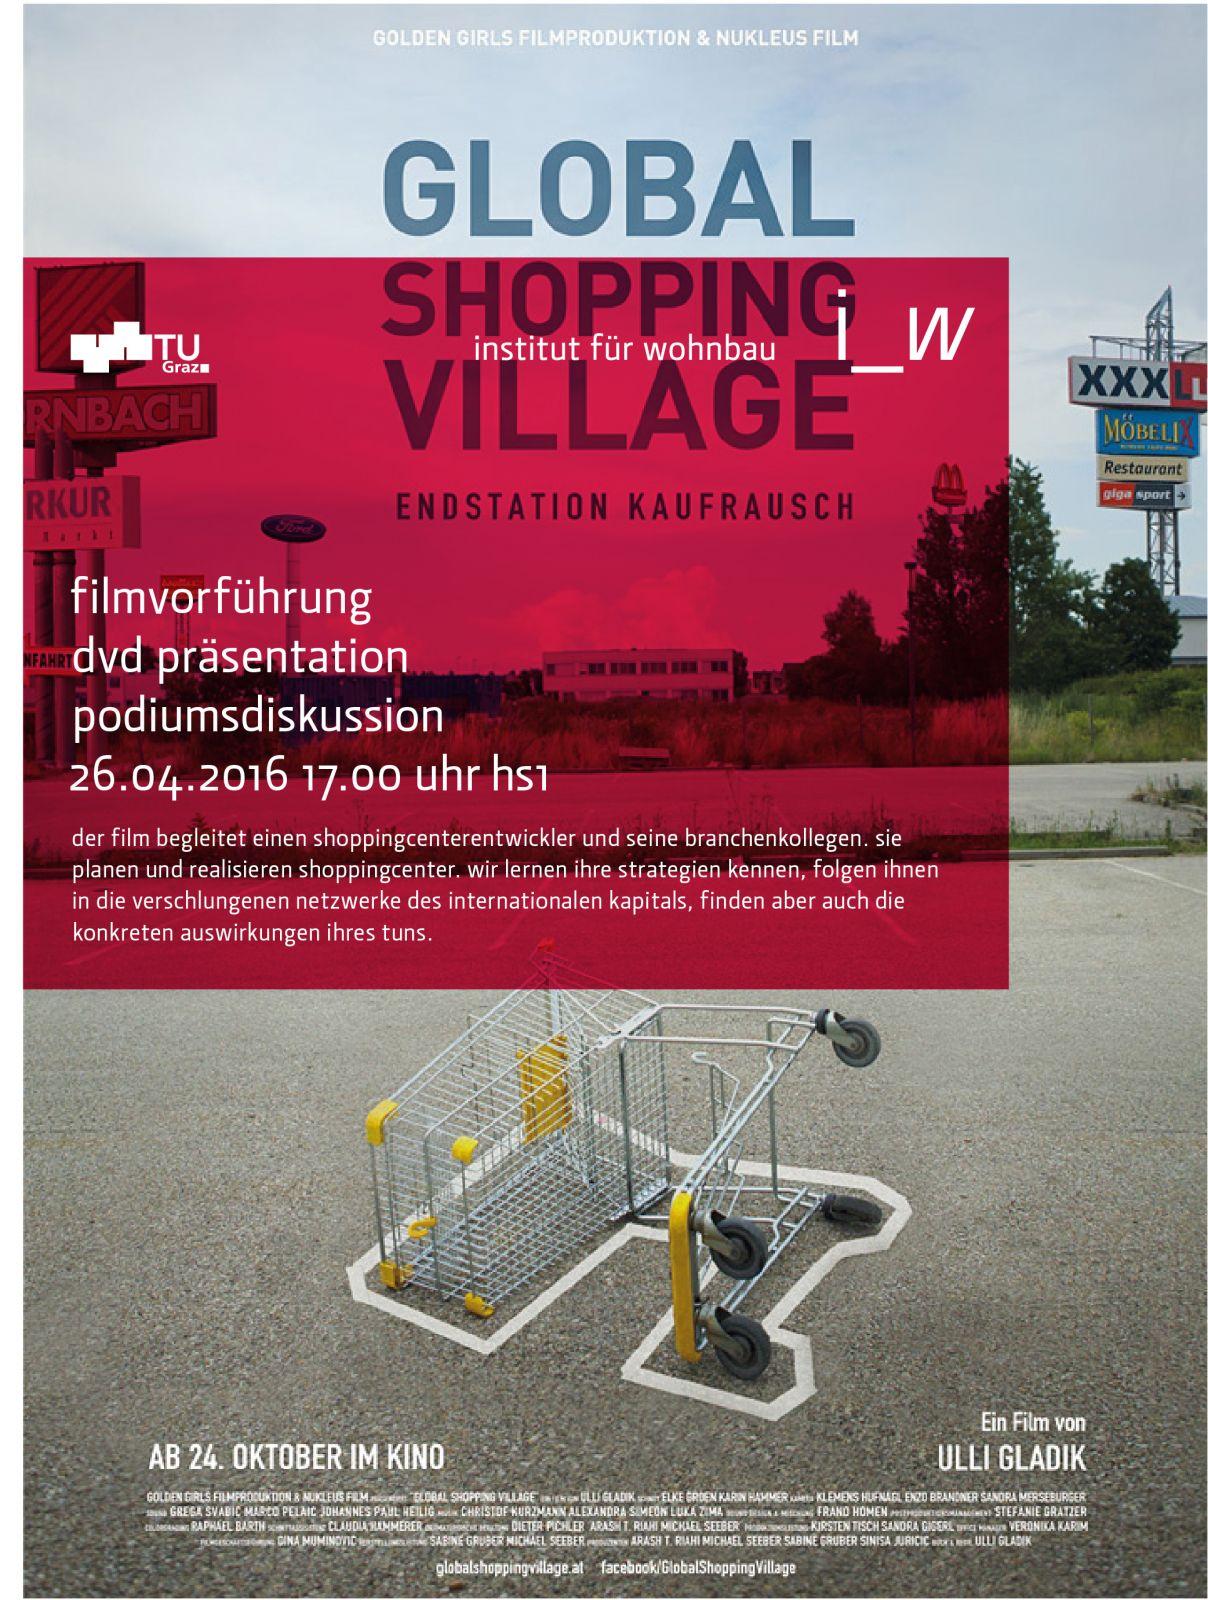 filmvorführung_dvd präsentation_podiumsdiskussion global shopping village